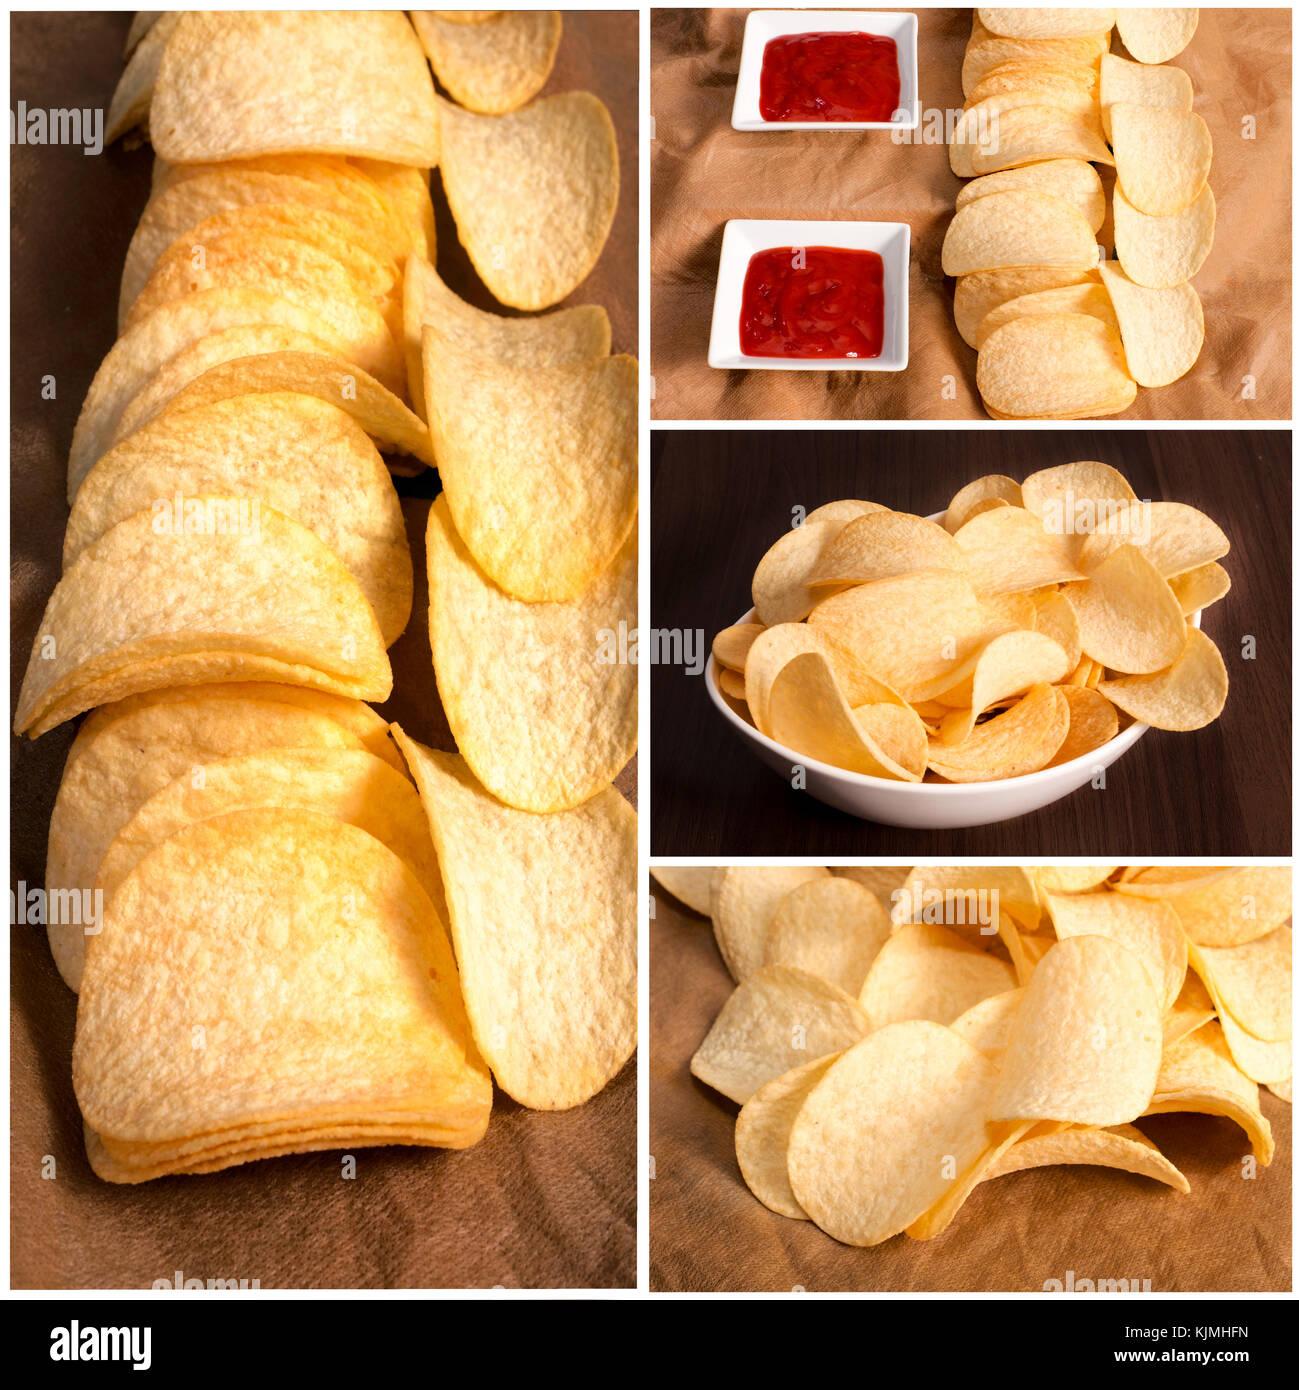 Fresh and homemade potato chips - Stock Image